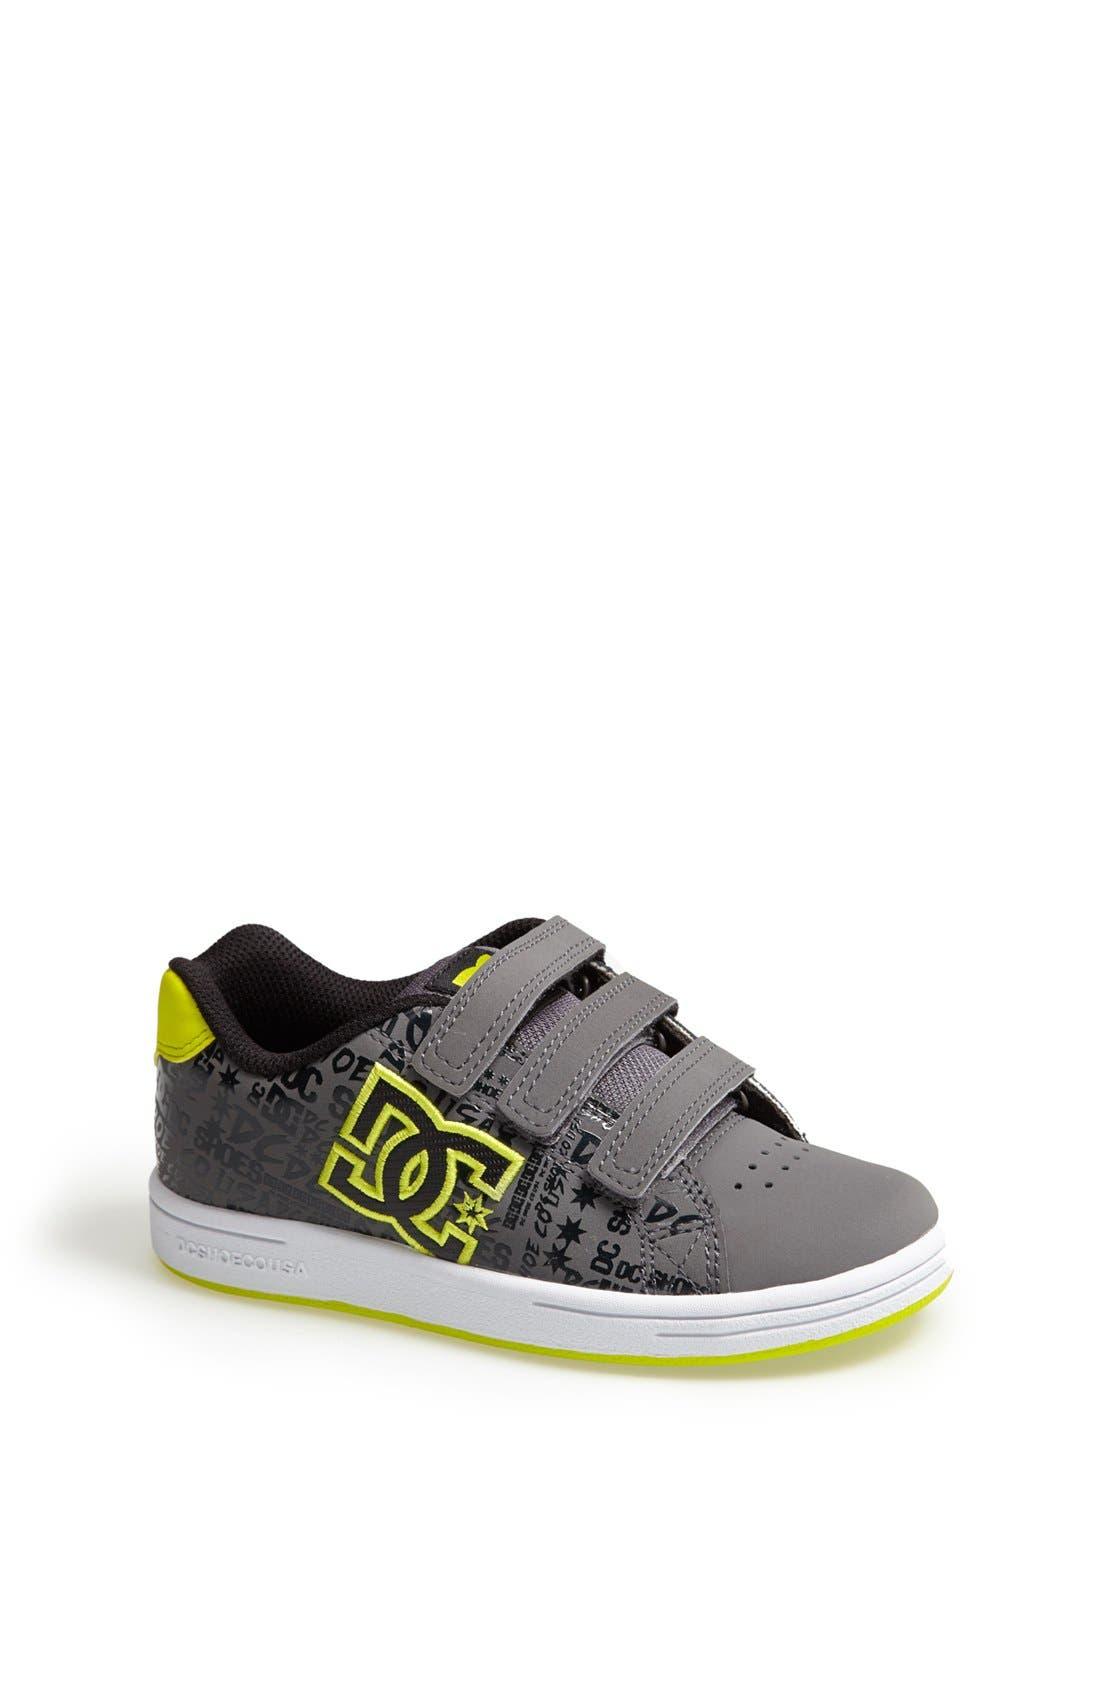 Main Image - DC Shoes 'Character V' Sneaker (Toddler & Little Kid)